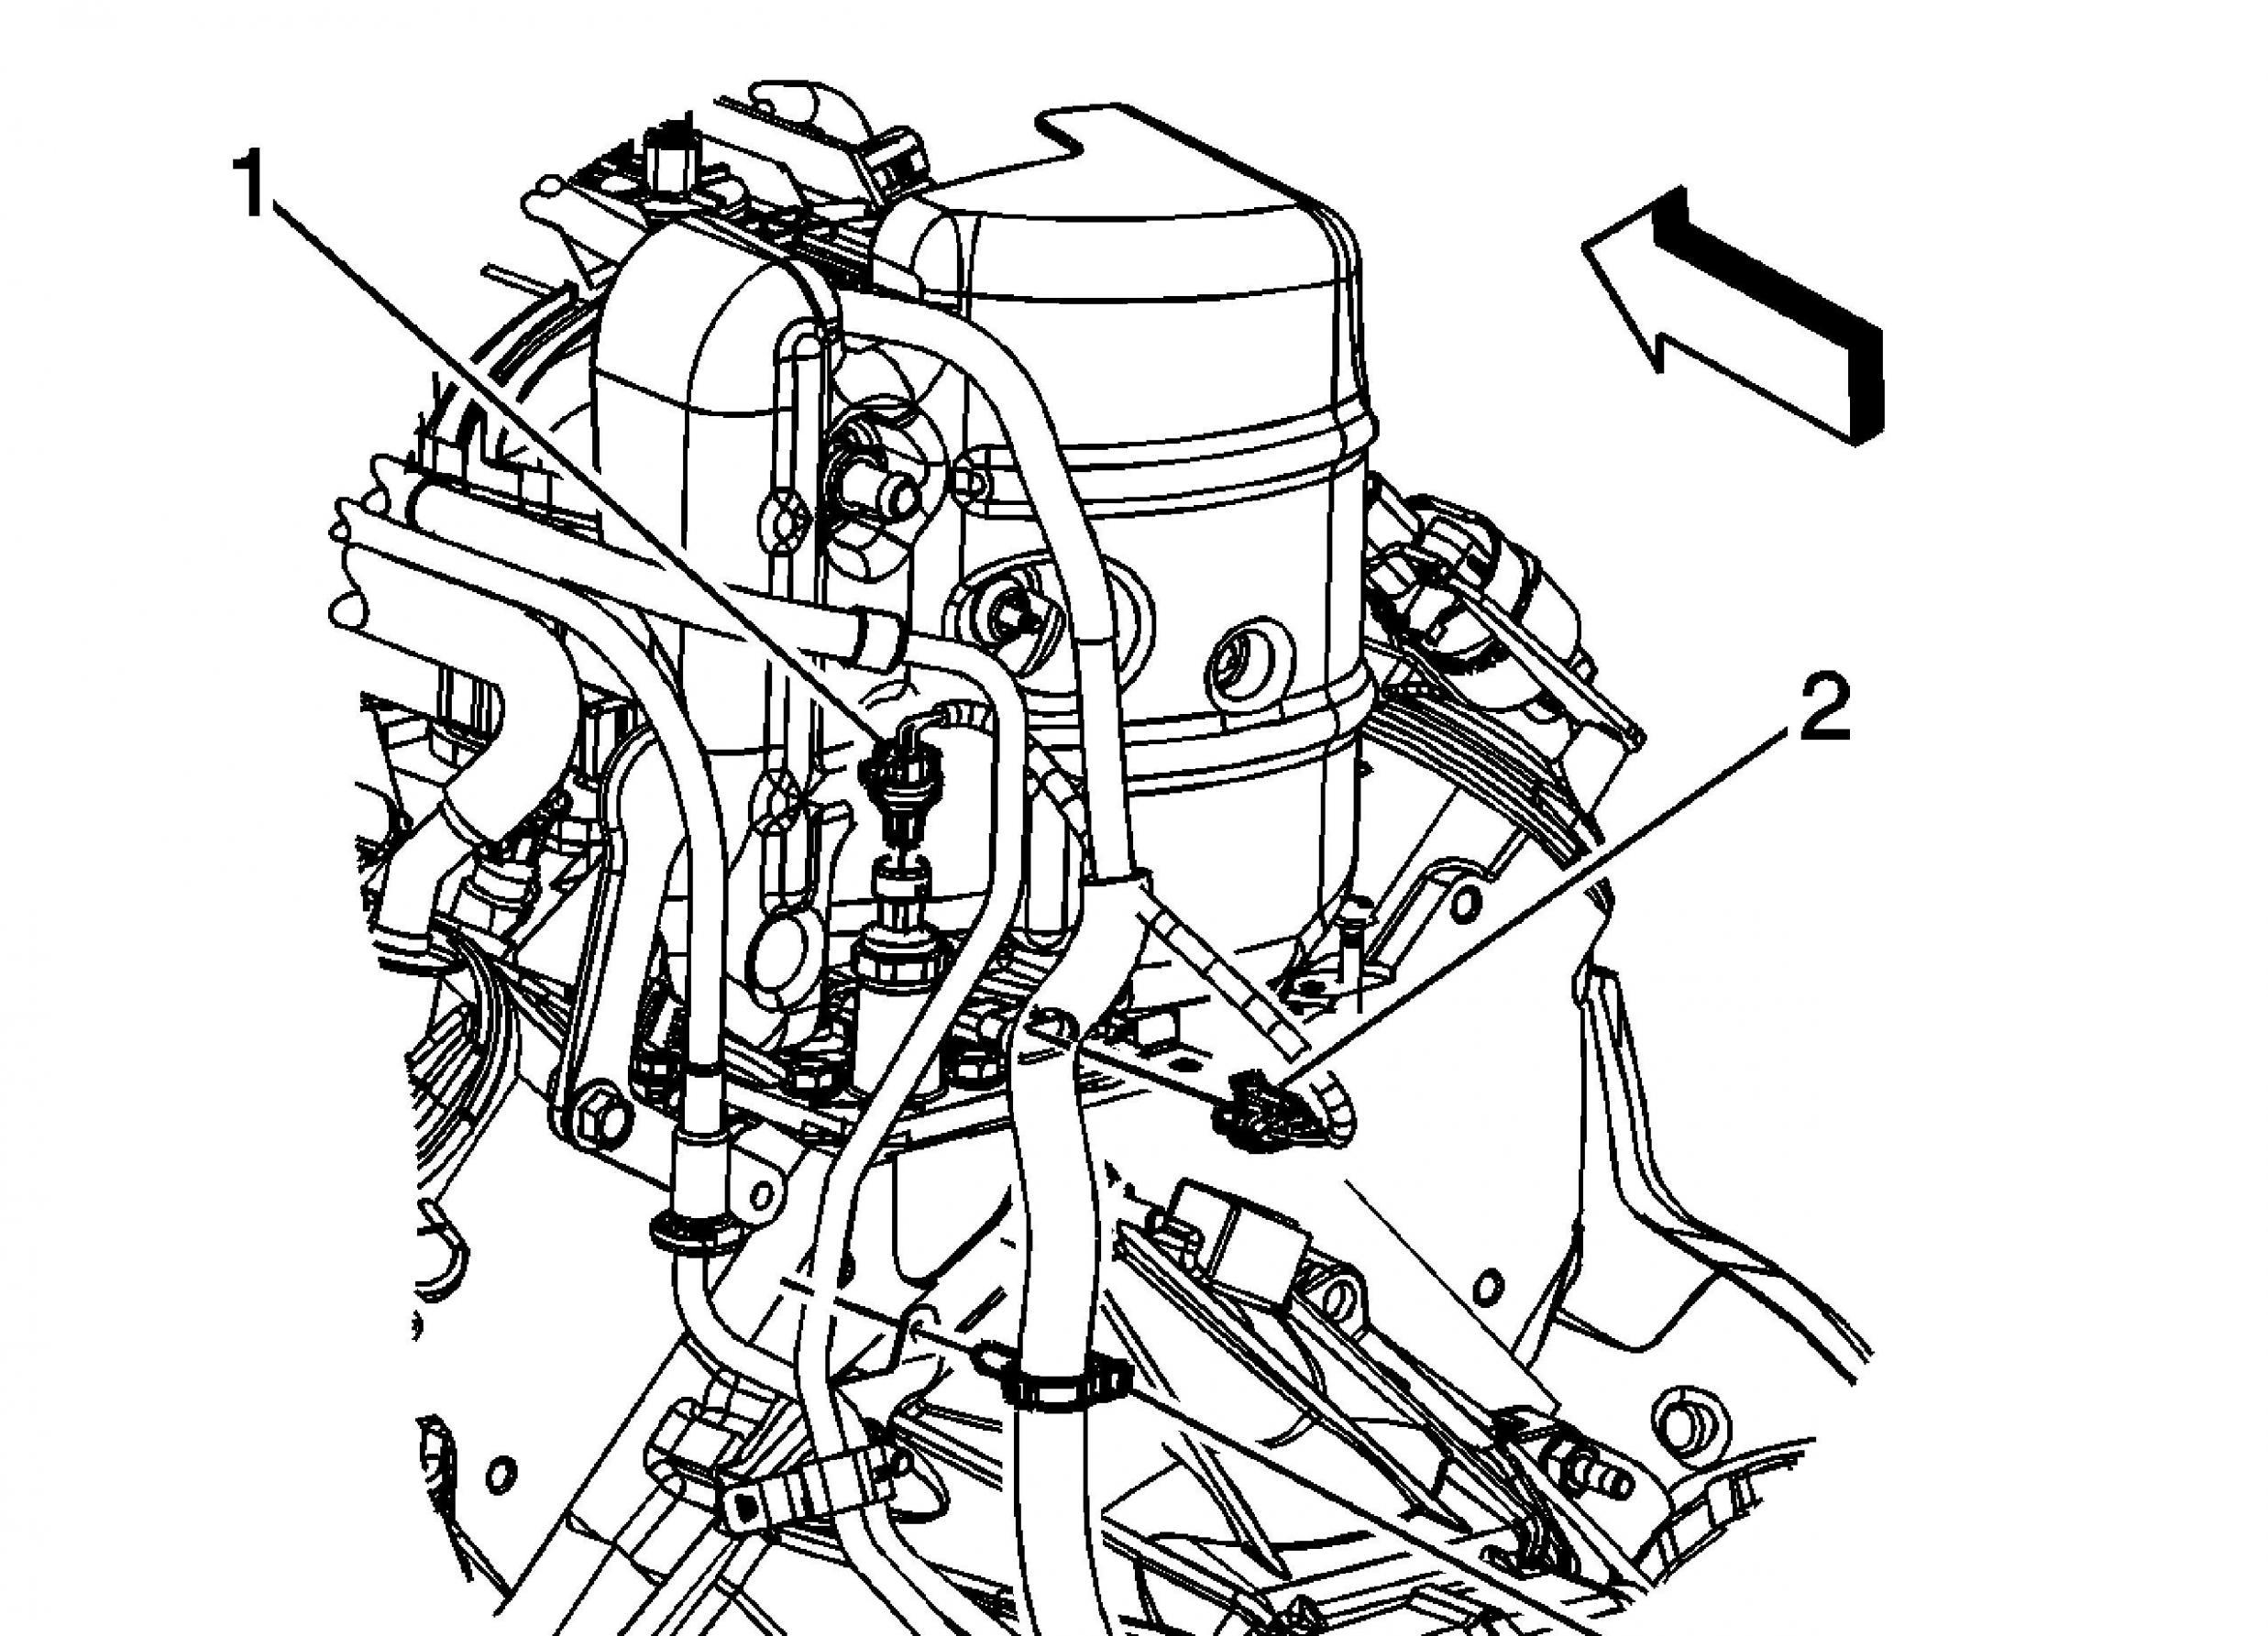 2007 tahoe engine diagram